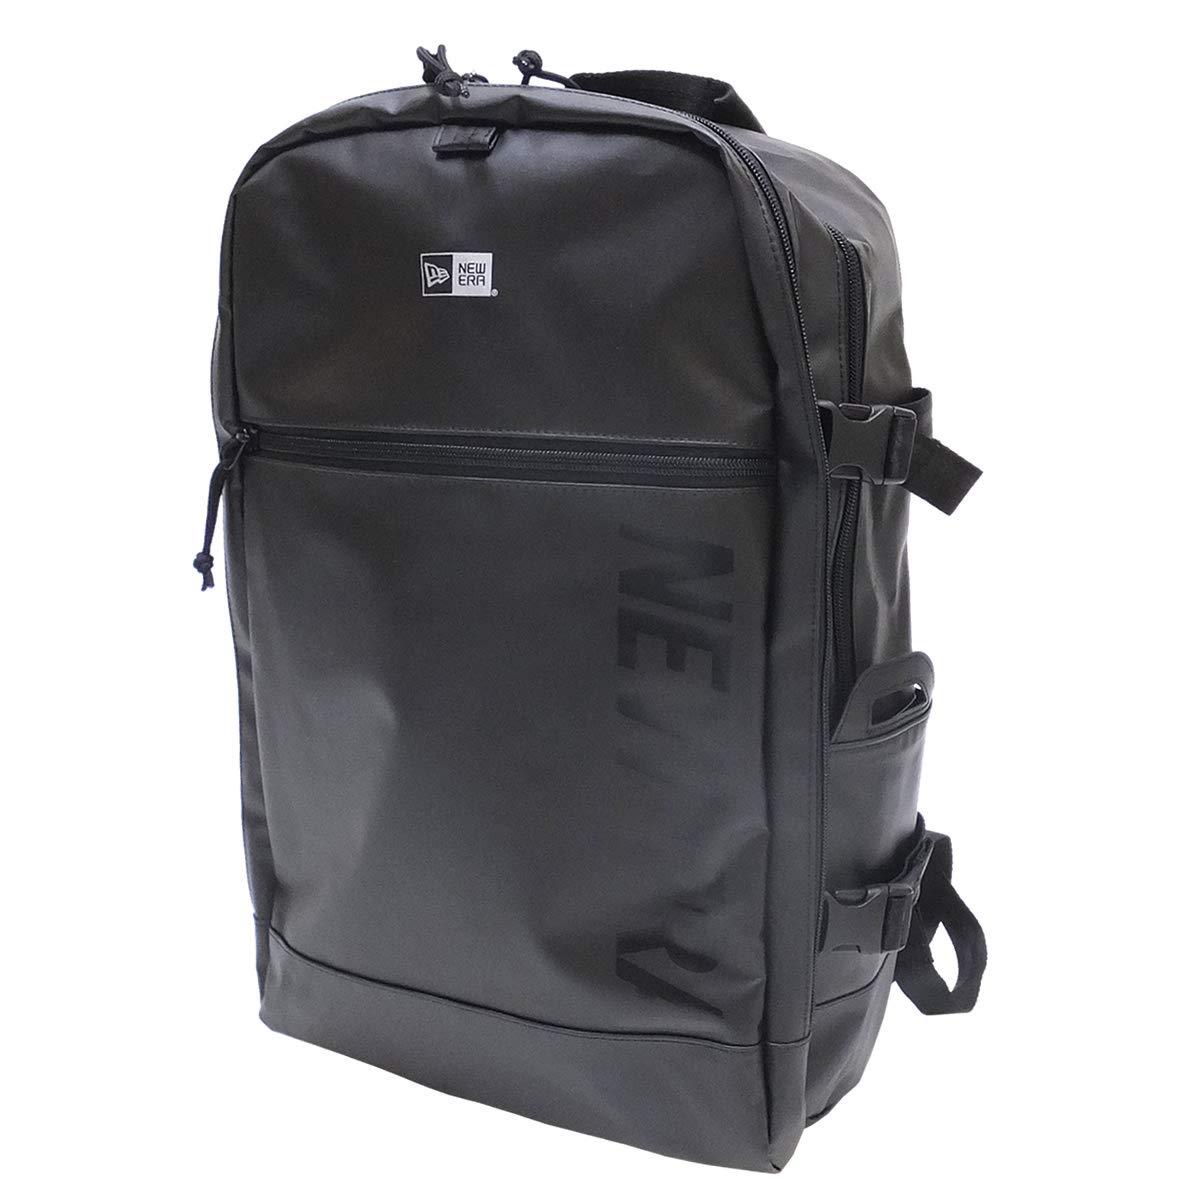 [New Era(ニューエラ)] リュック バックパック 大容量 スマートパック プリントロゴ ターポリン×ブラック 11901925   B07QMVQ2T2